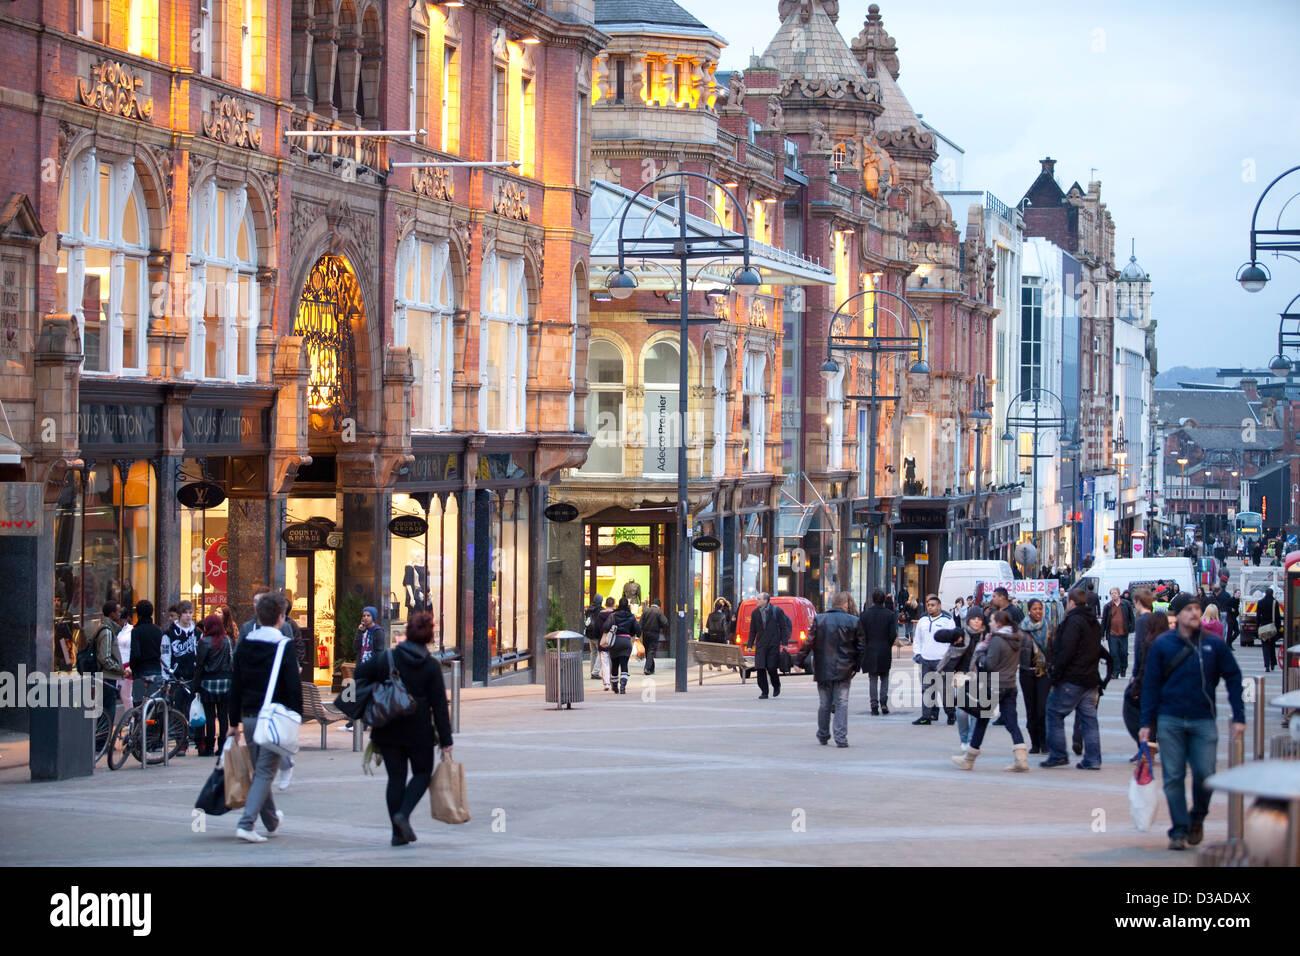 Leeds , West Yorkshire - City Centre Shopping - - Stock Image